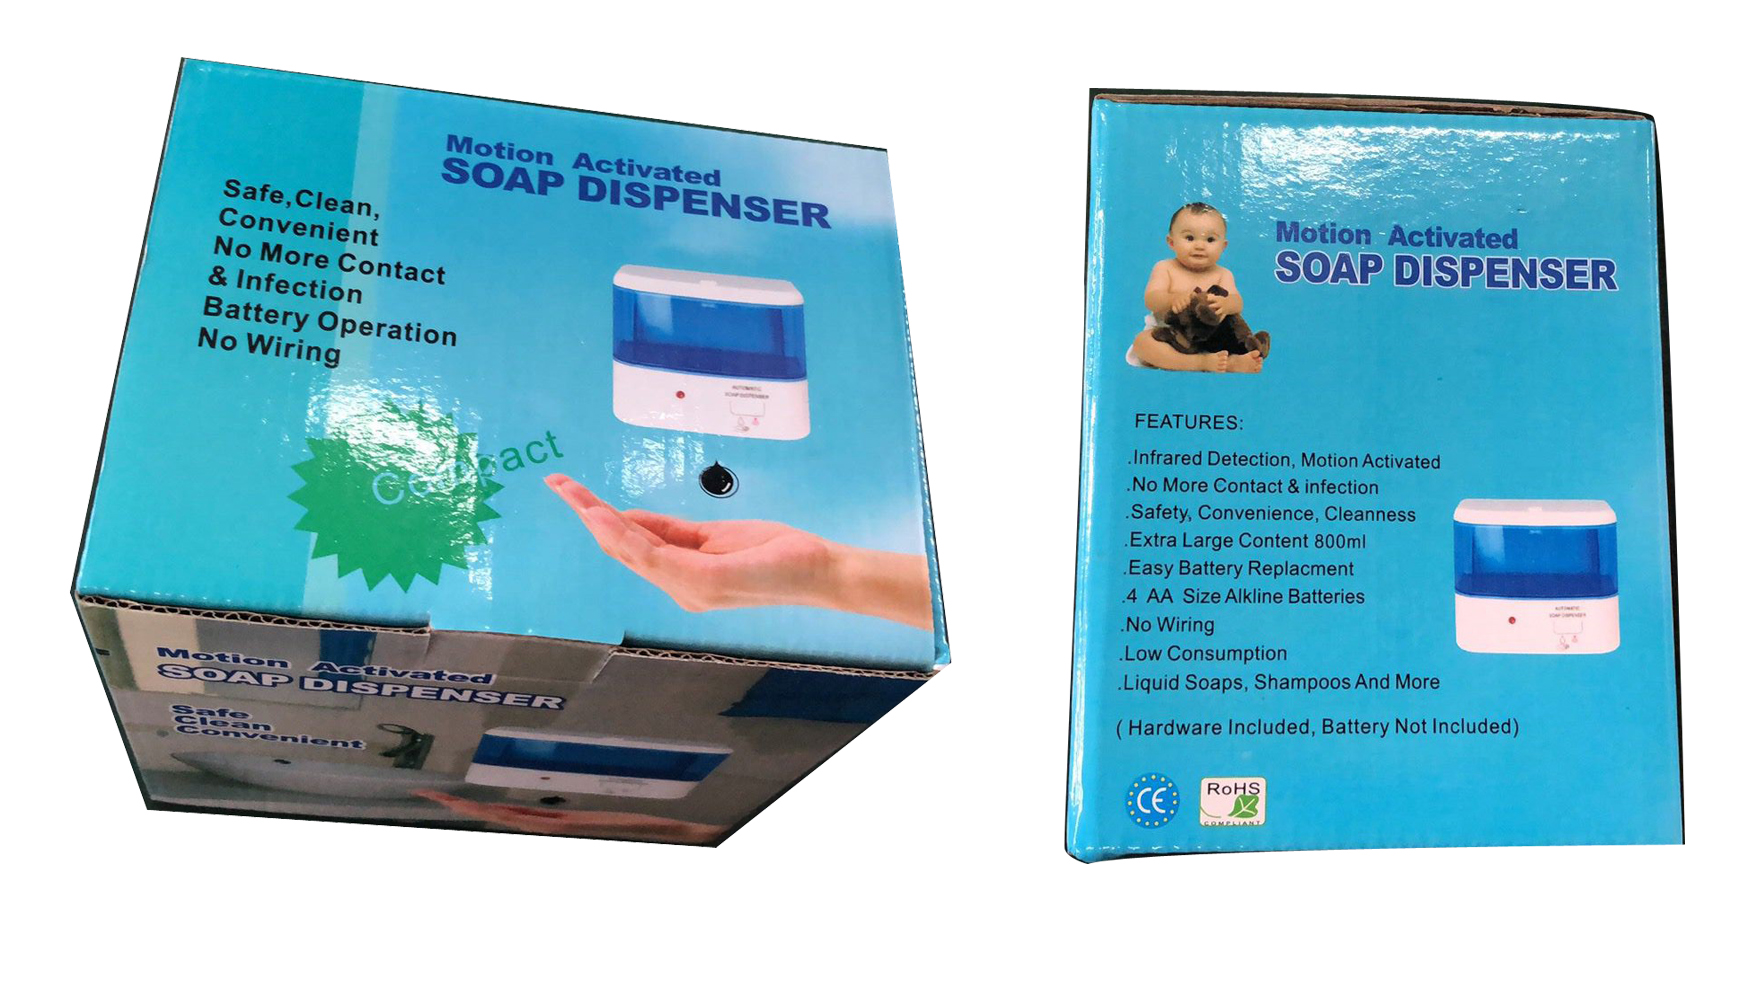 auto soap dispenser in foam